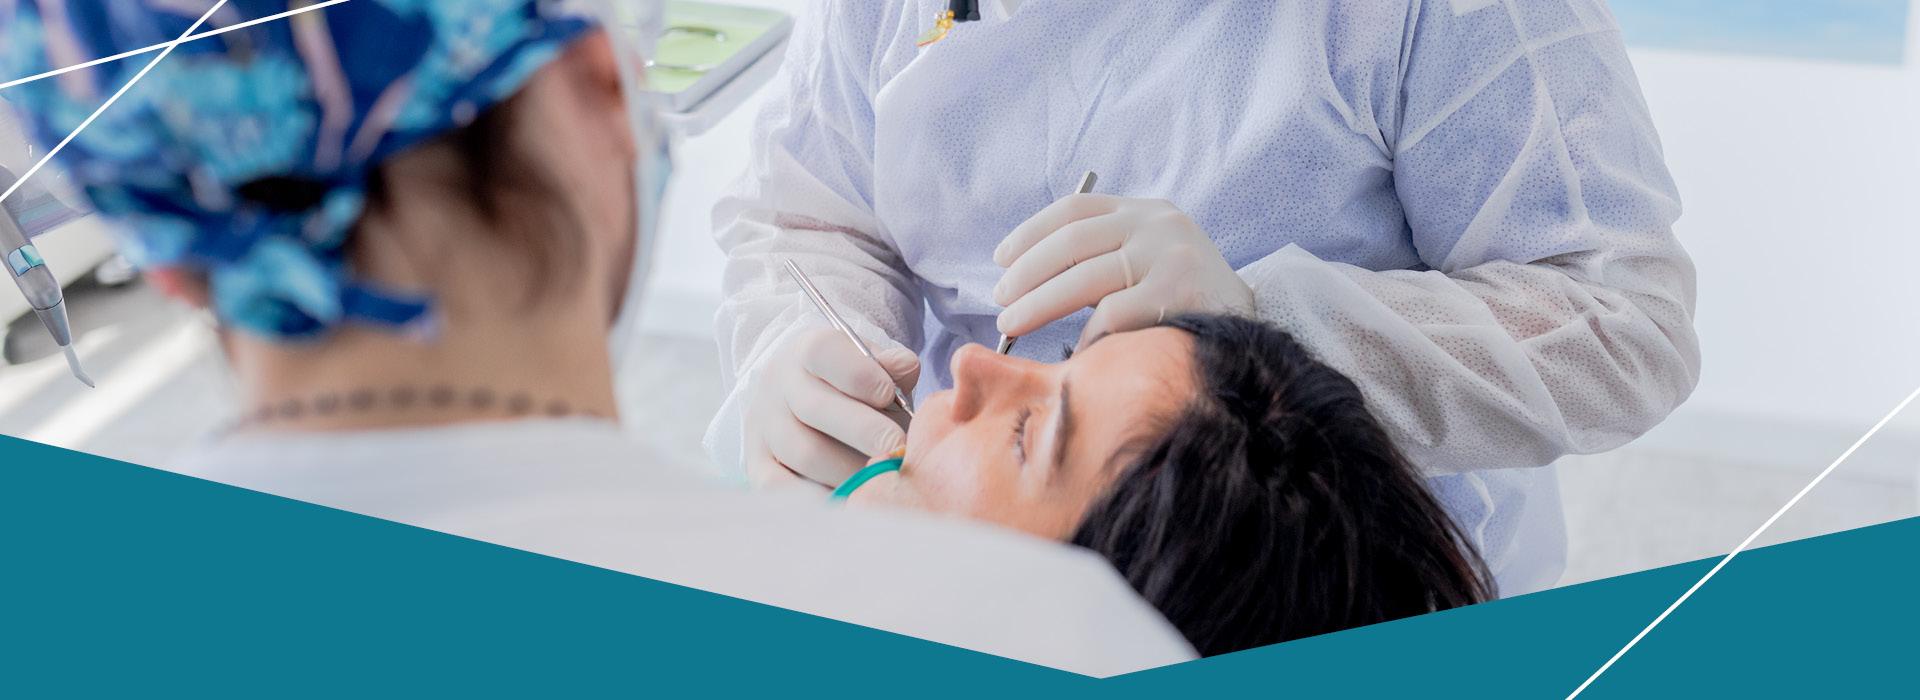 garda-odontoiatria-ambulatorio-chirurgico